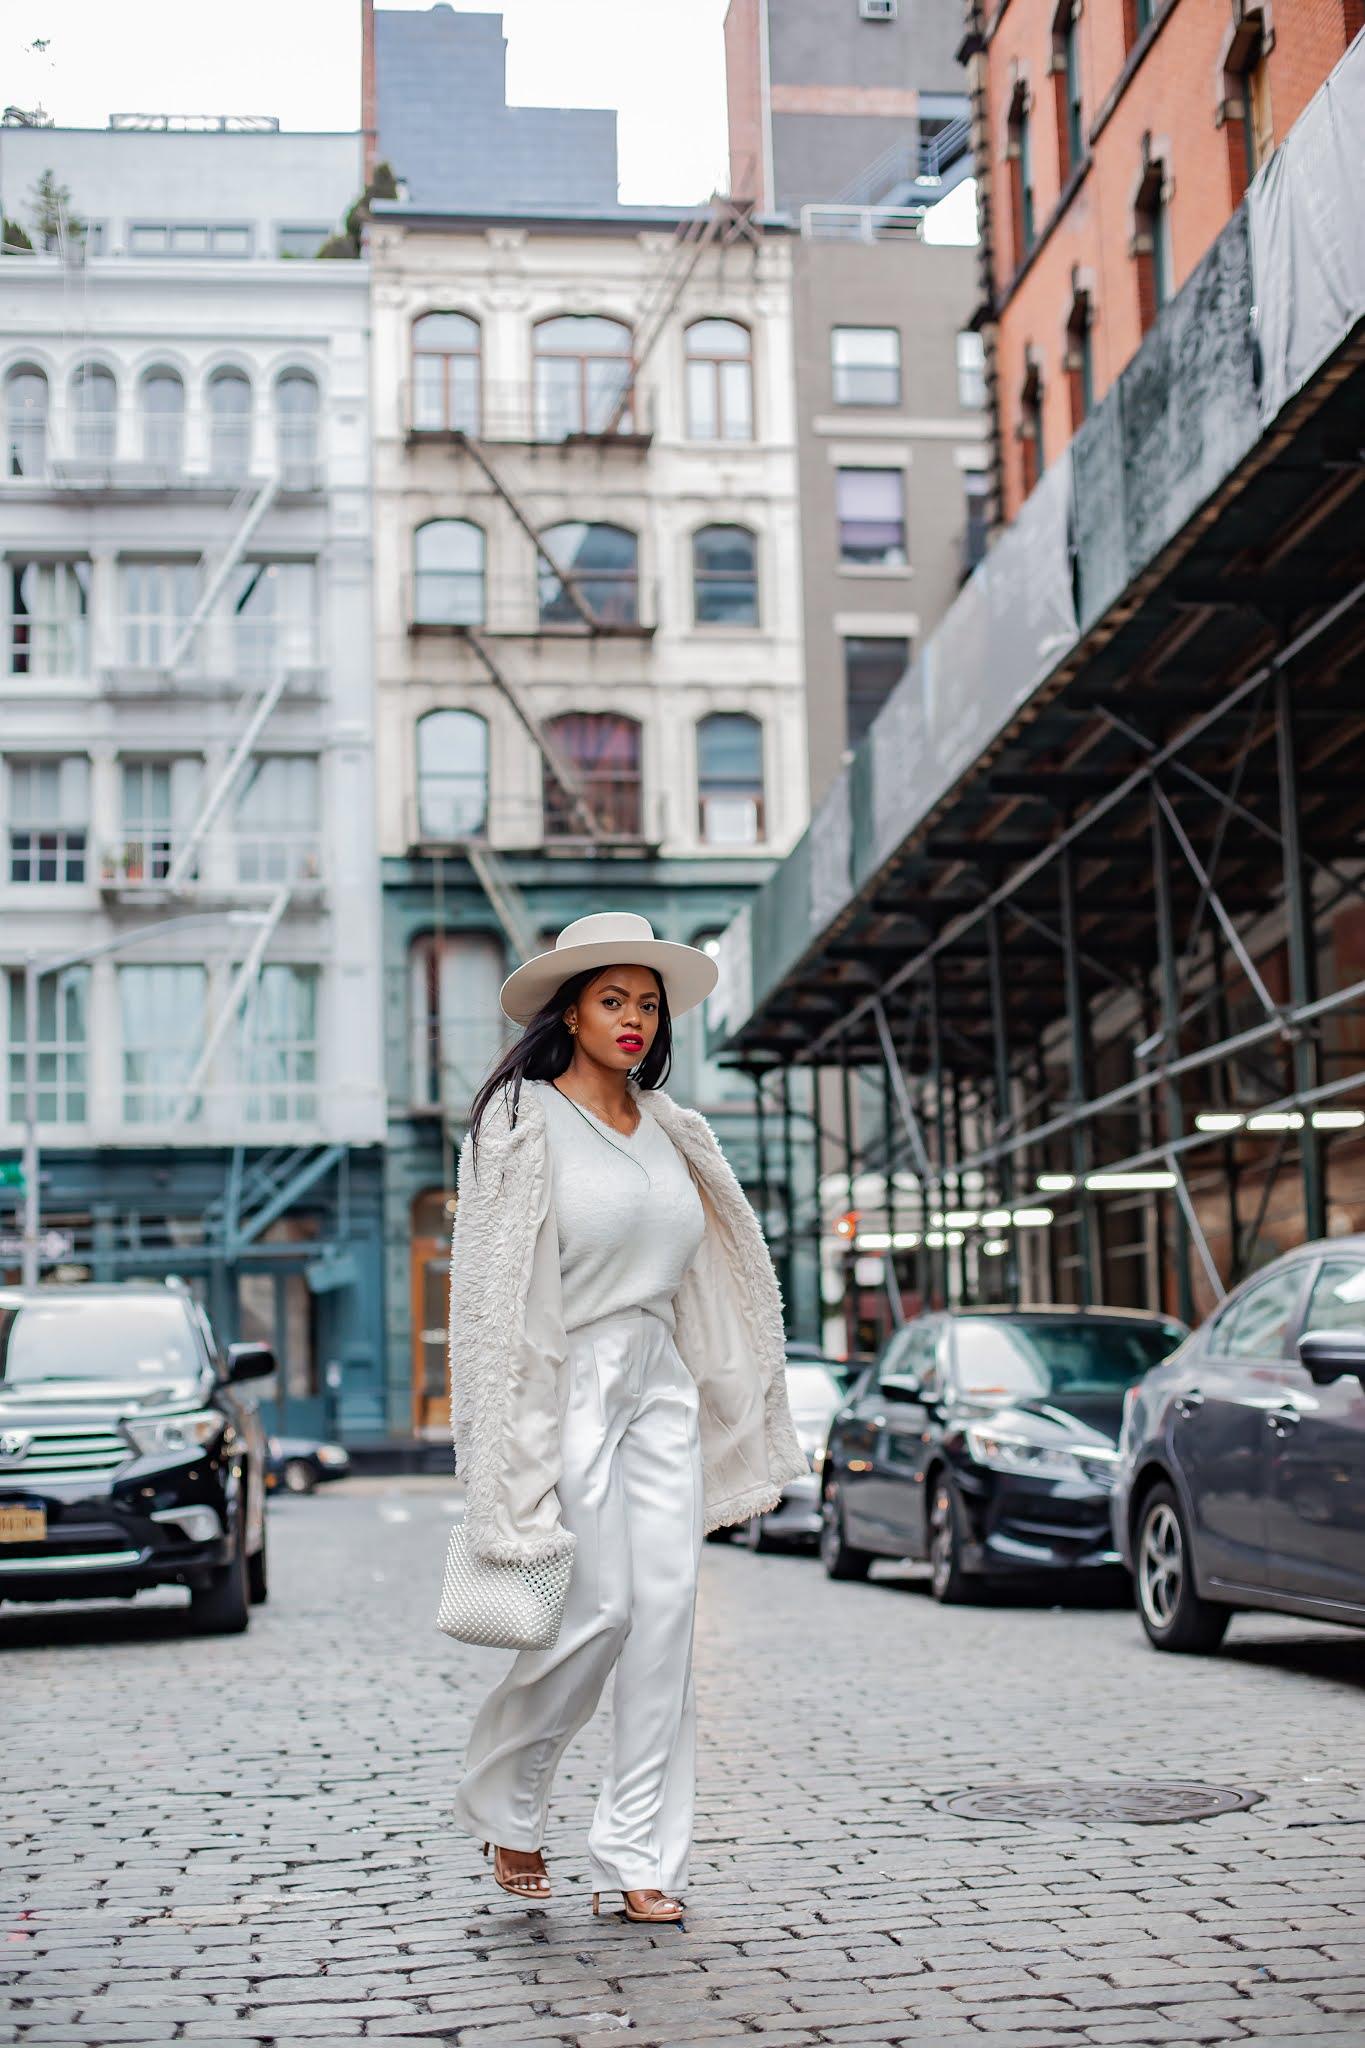 BEST Photo Spots in New York : SOHO